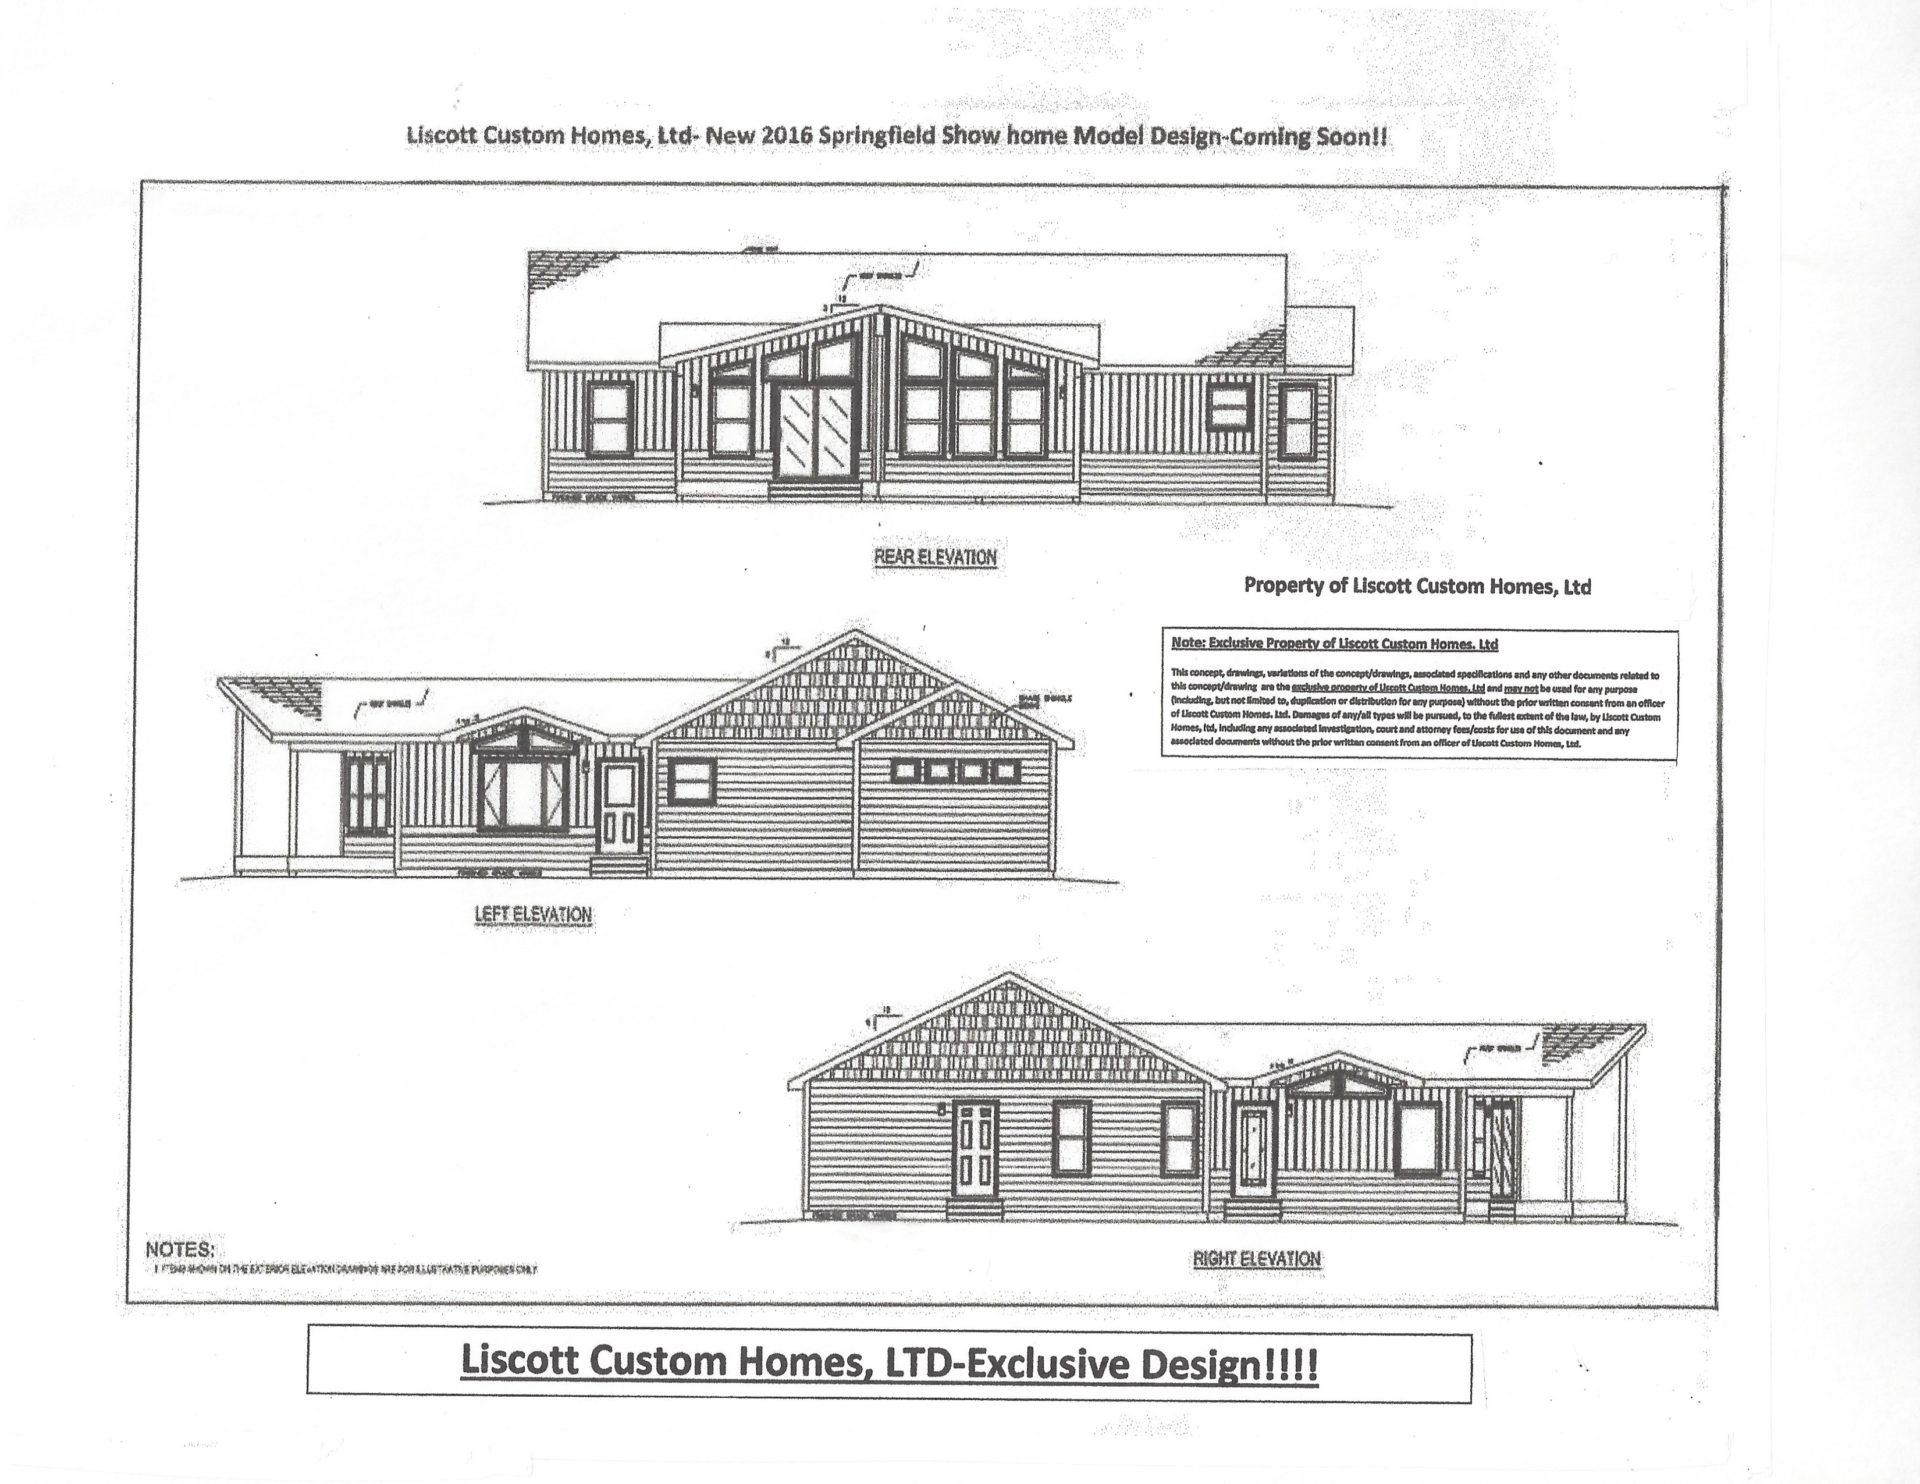 Liscott New Prow Ranch Design Liscott Custom Homes Ltd - Customs homes designs